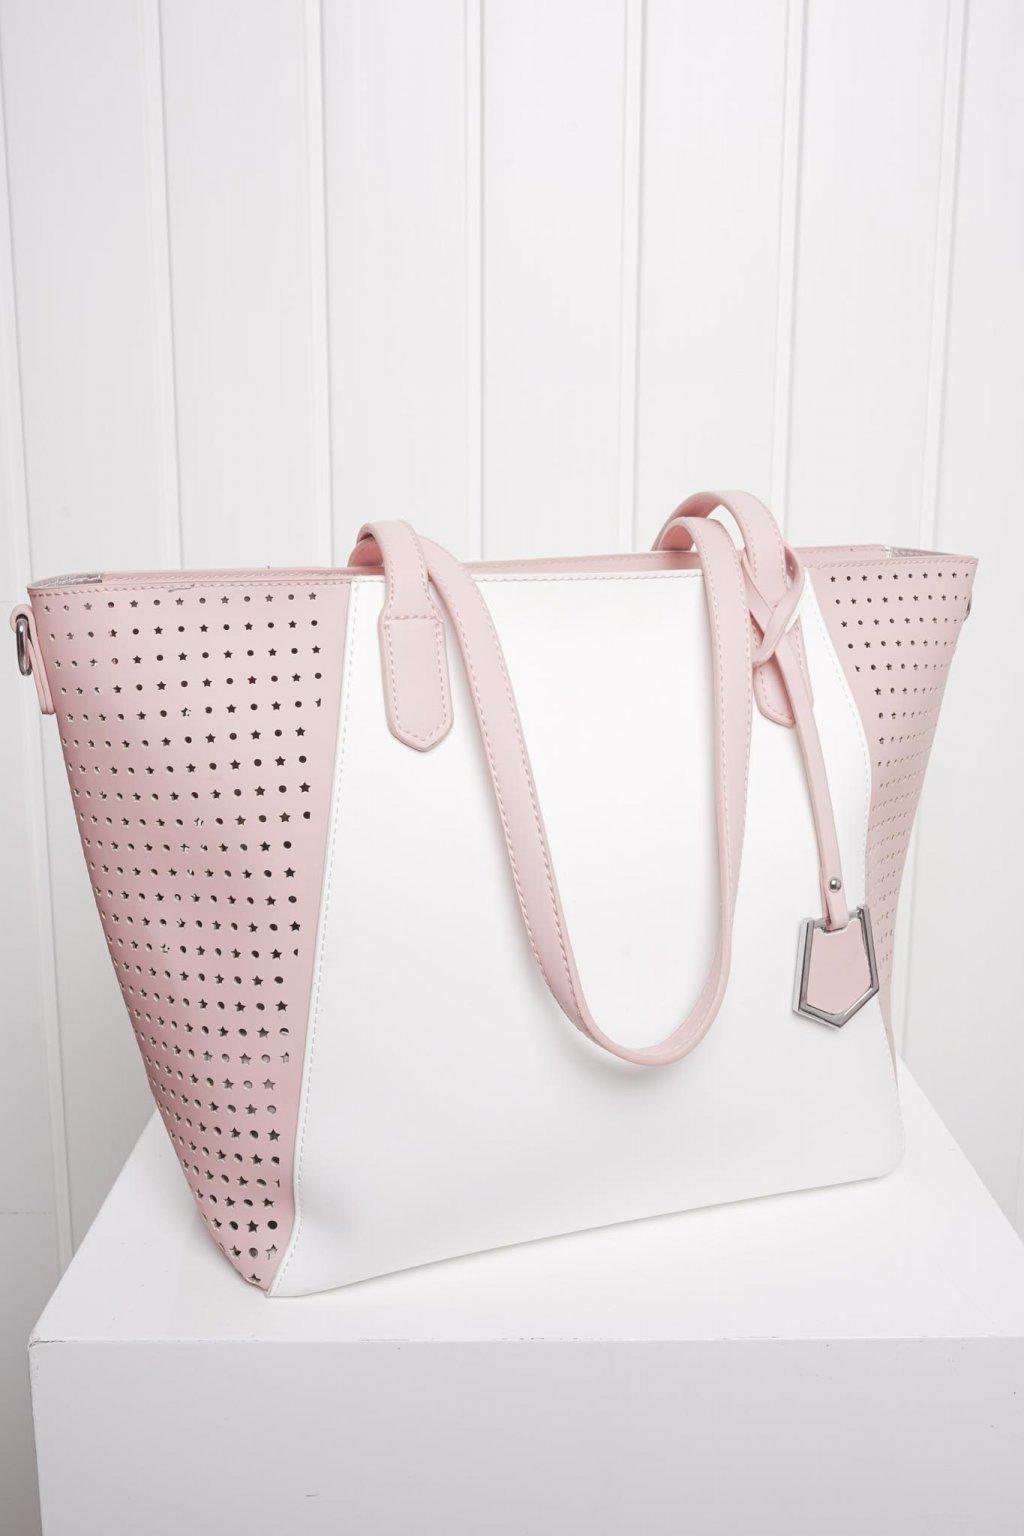 Kabelka, ruksak, dobrá cena, čierna kabelka, čierny ruksak, basic, kabelky, ruksaky 094